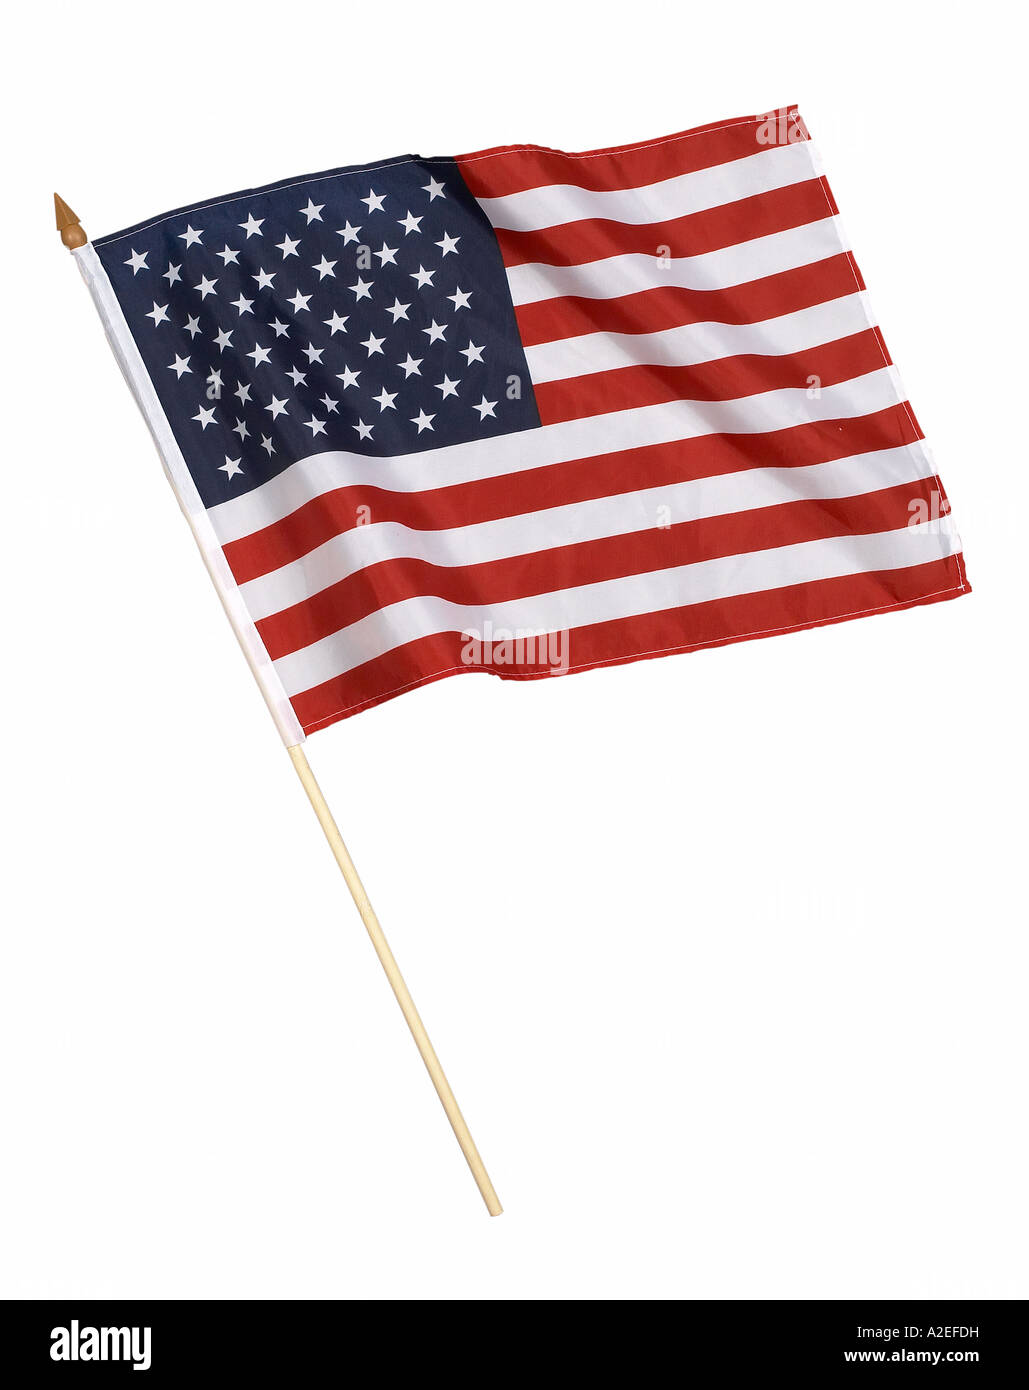 American Flag Studio Still Life - Stock Image